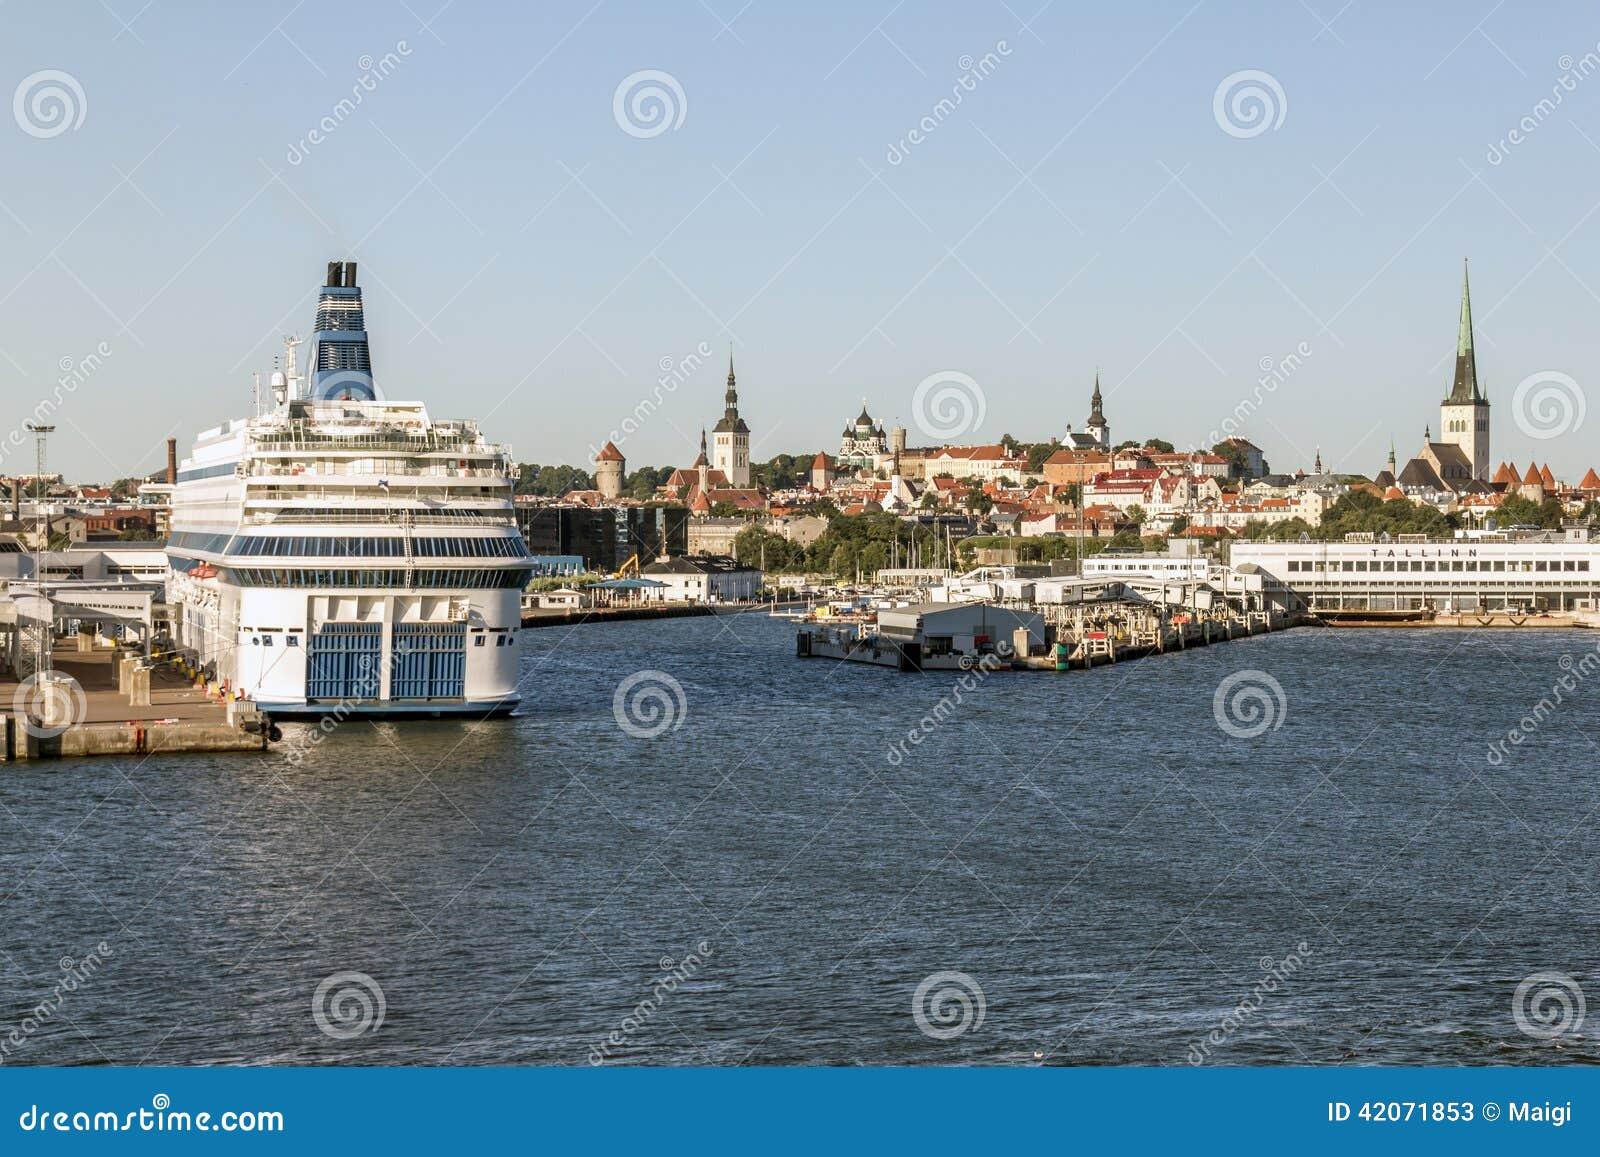 Download Port of Tallinn Estonia stock image. Image of town, harbour - 42071853